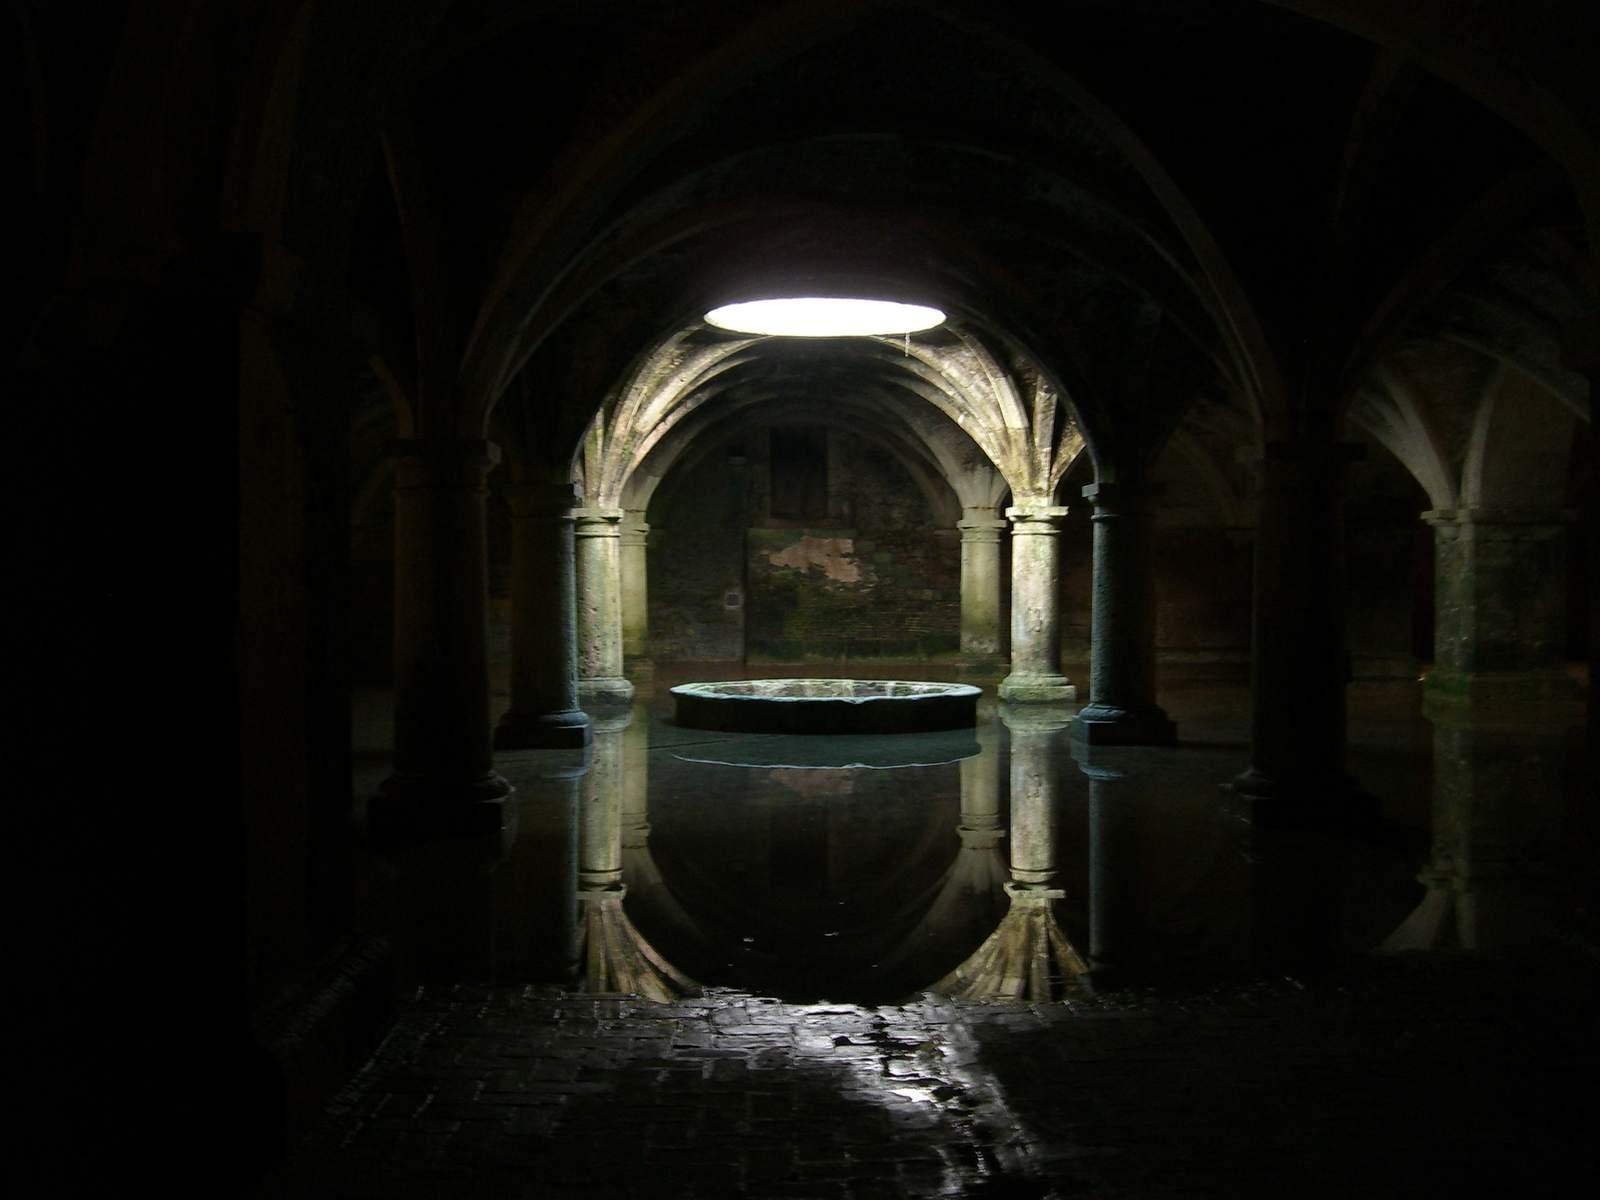 el jadida2 Portuguese El Jadida Cistern, Morocco